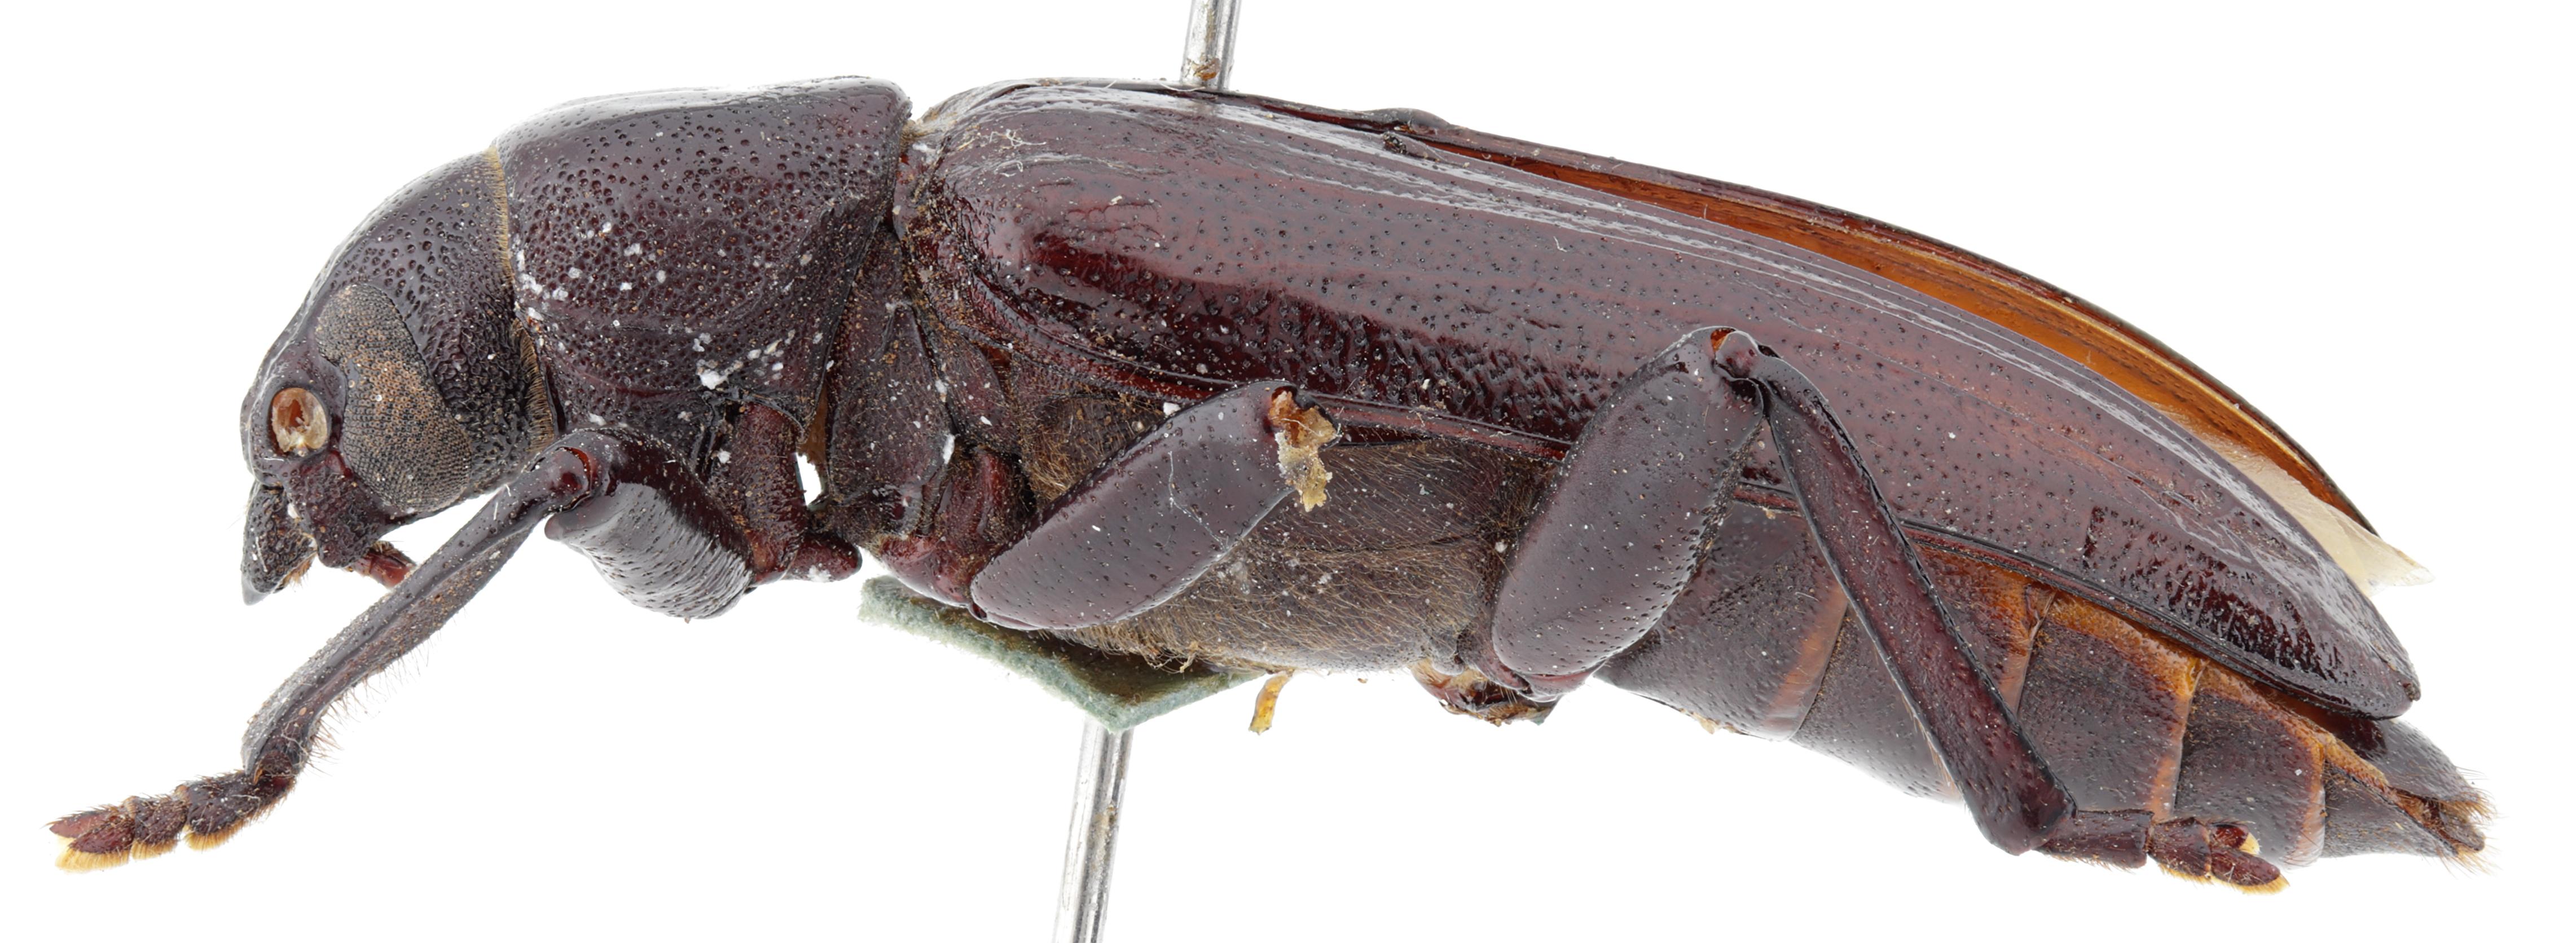 Aulocopus rivalus ht M L.jpg